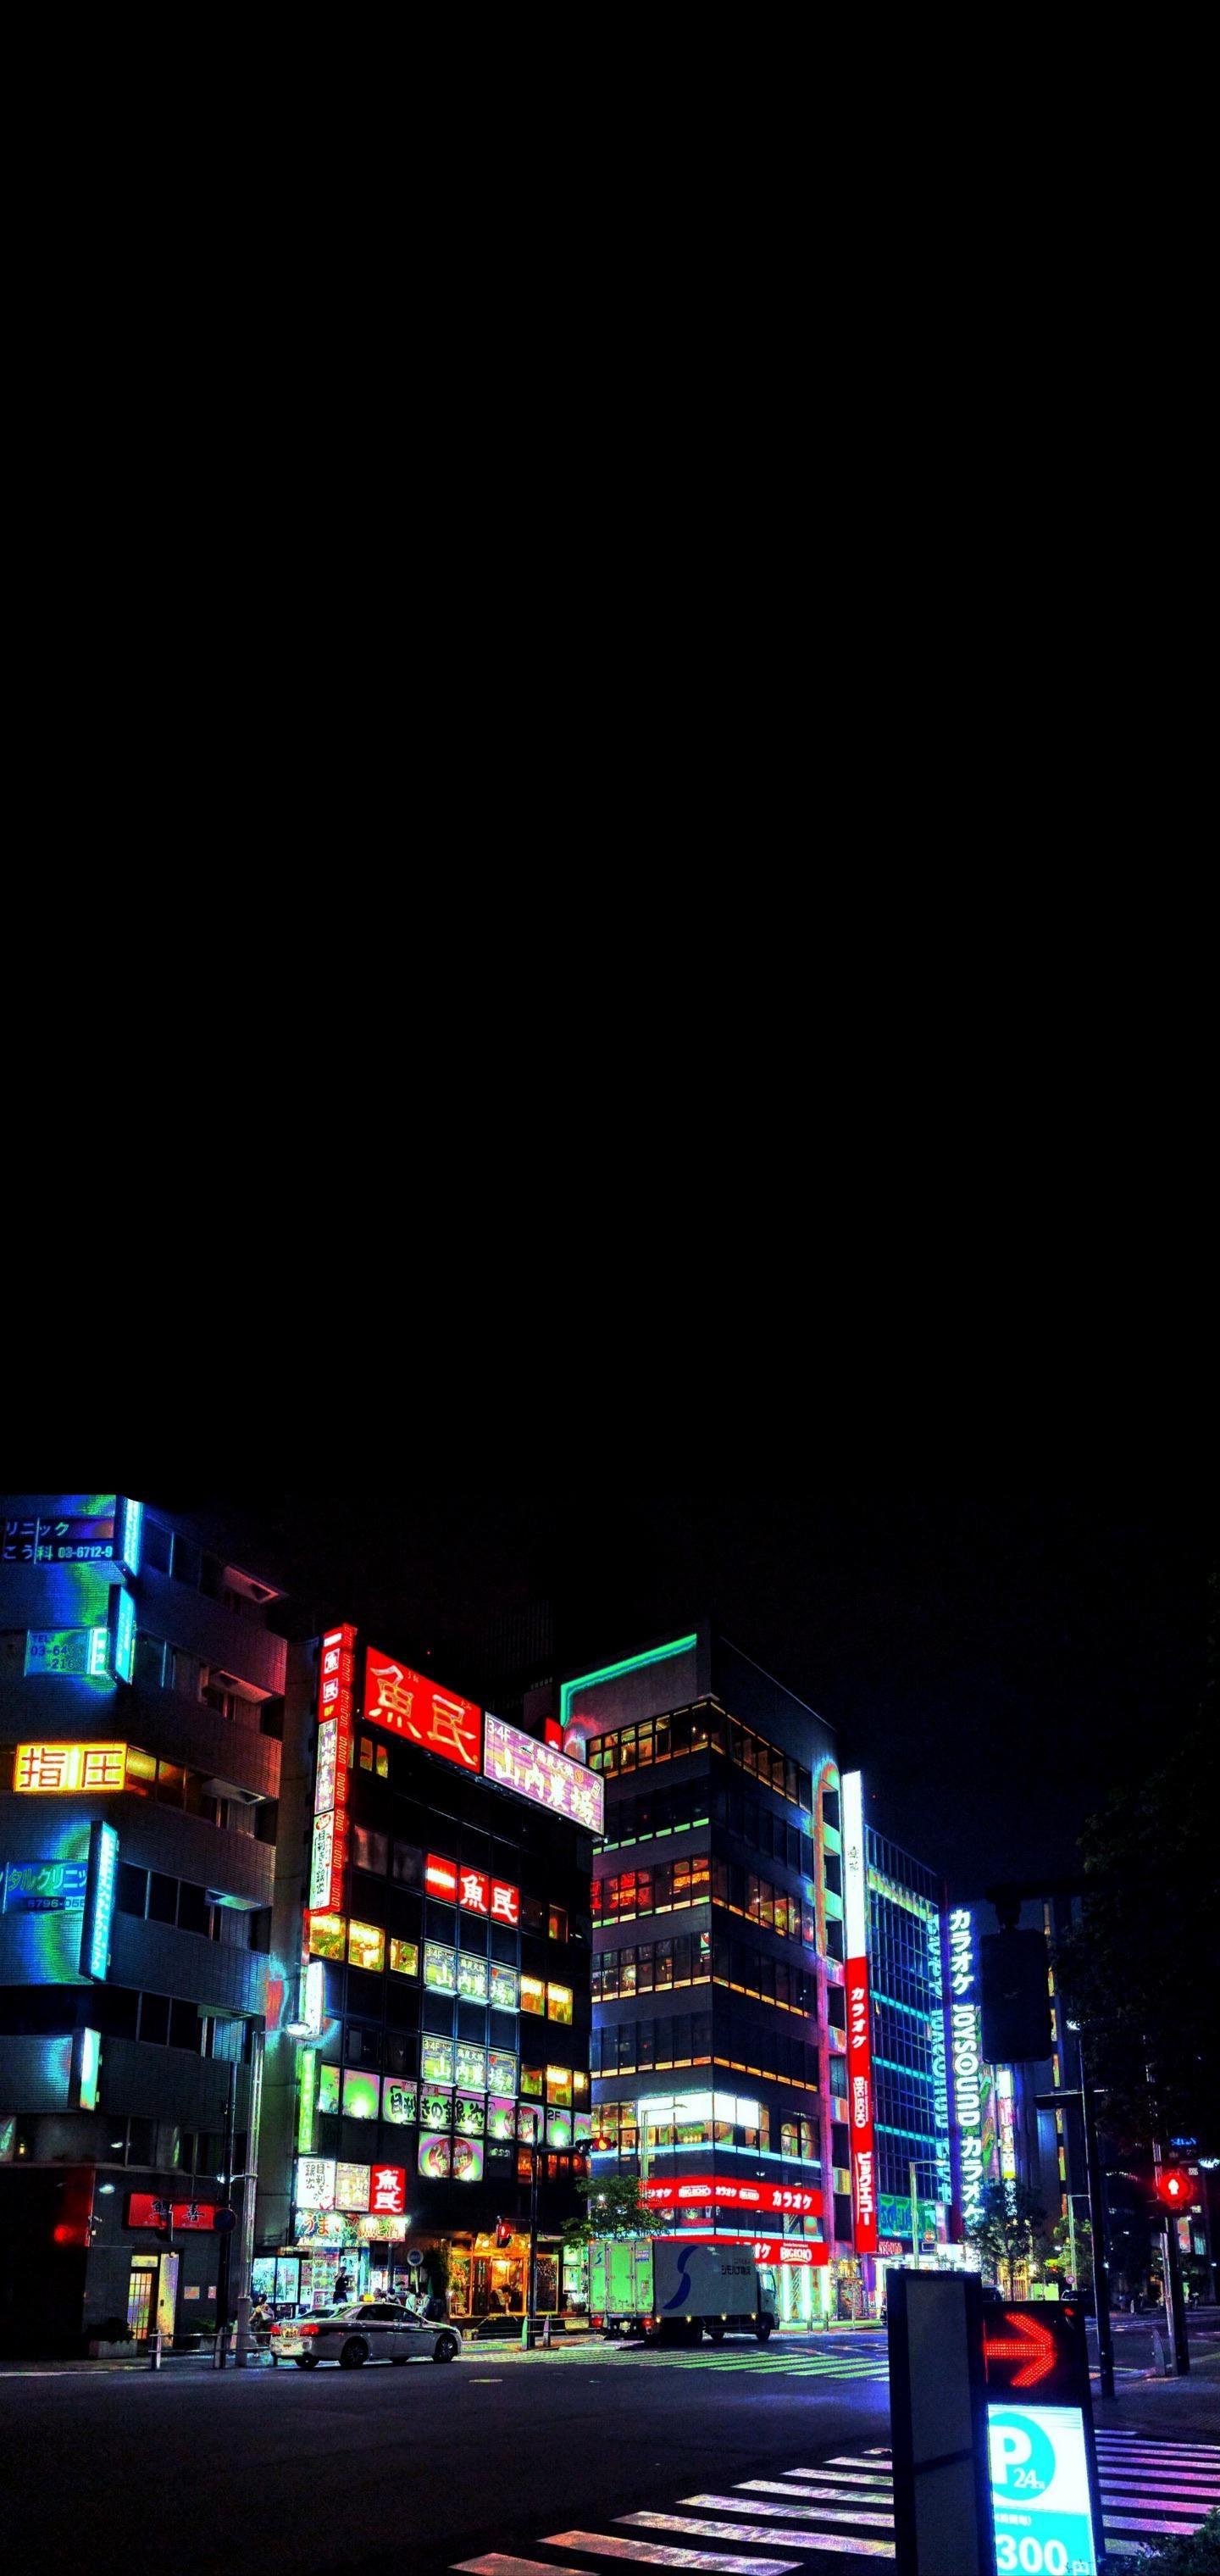 Nighttime Tokyo 1440x3040 In 2020 Iphone Homescreen Wallpaper Iphone Wallpaper Iphone Lockscreen